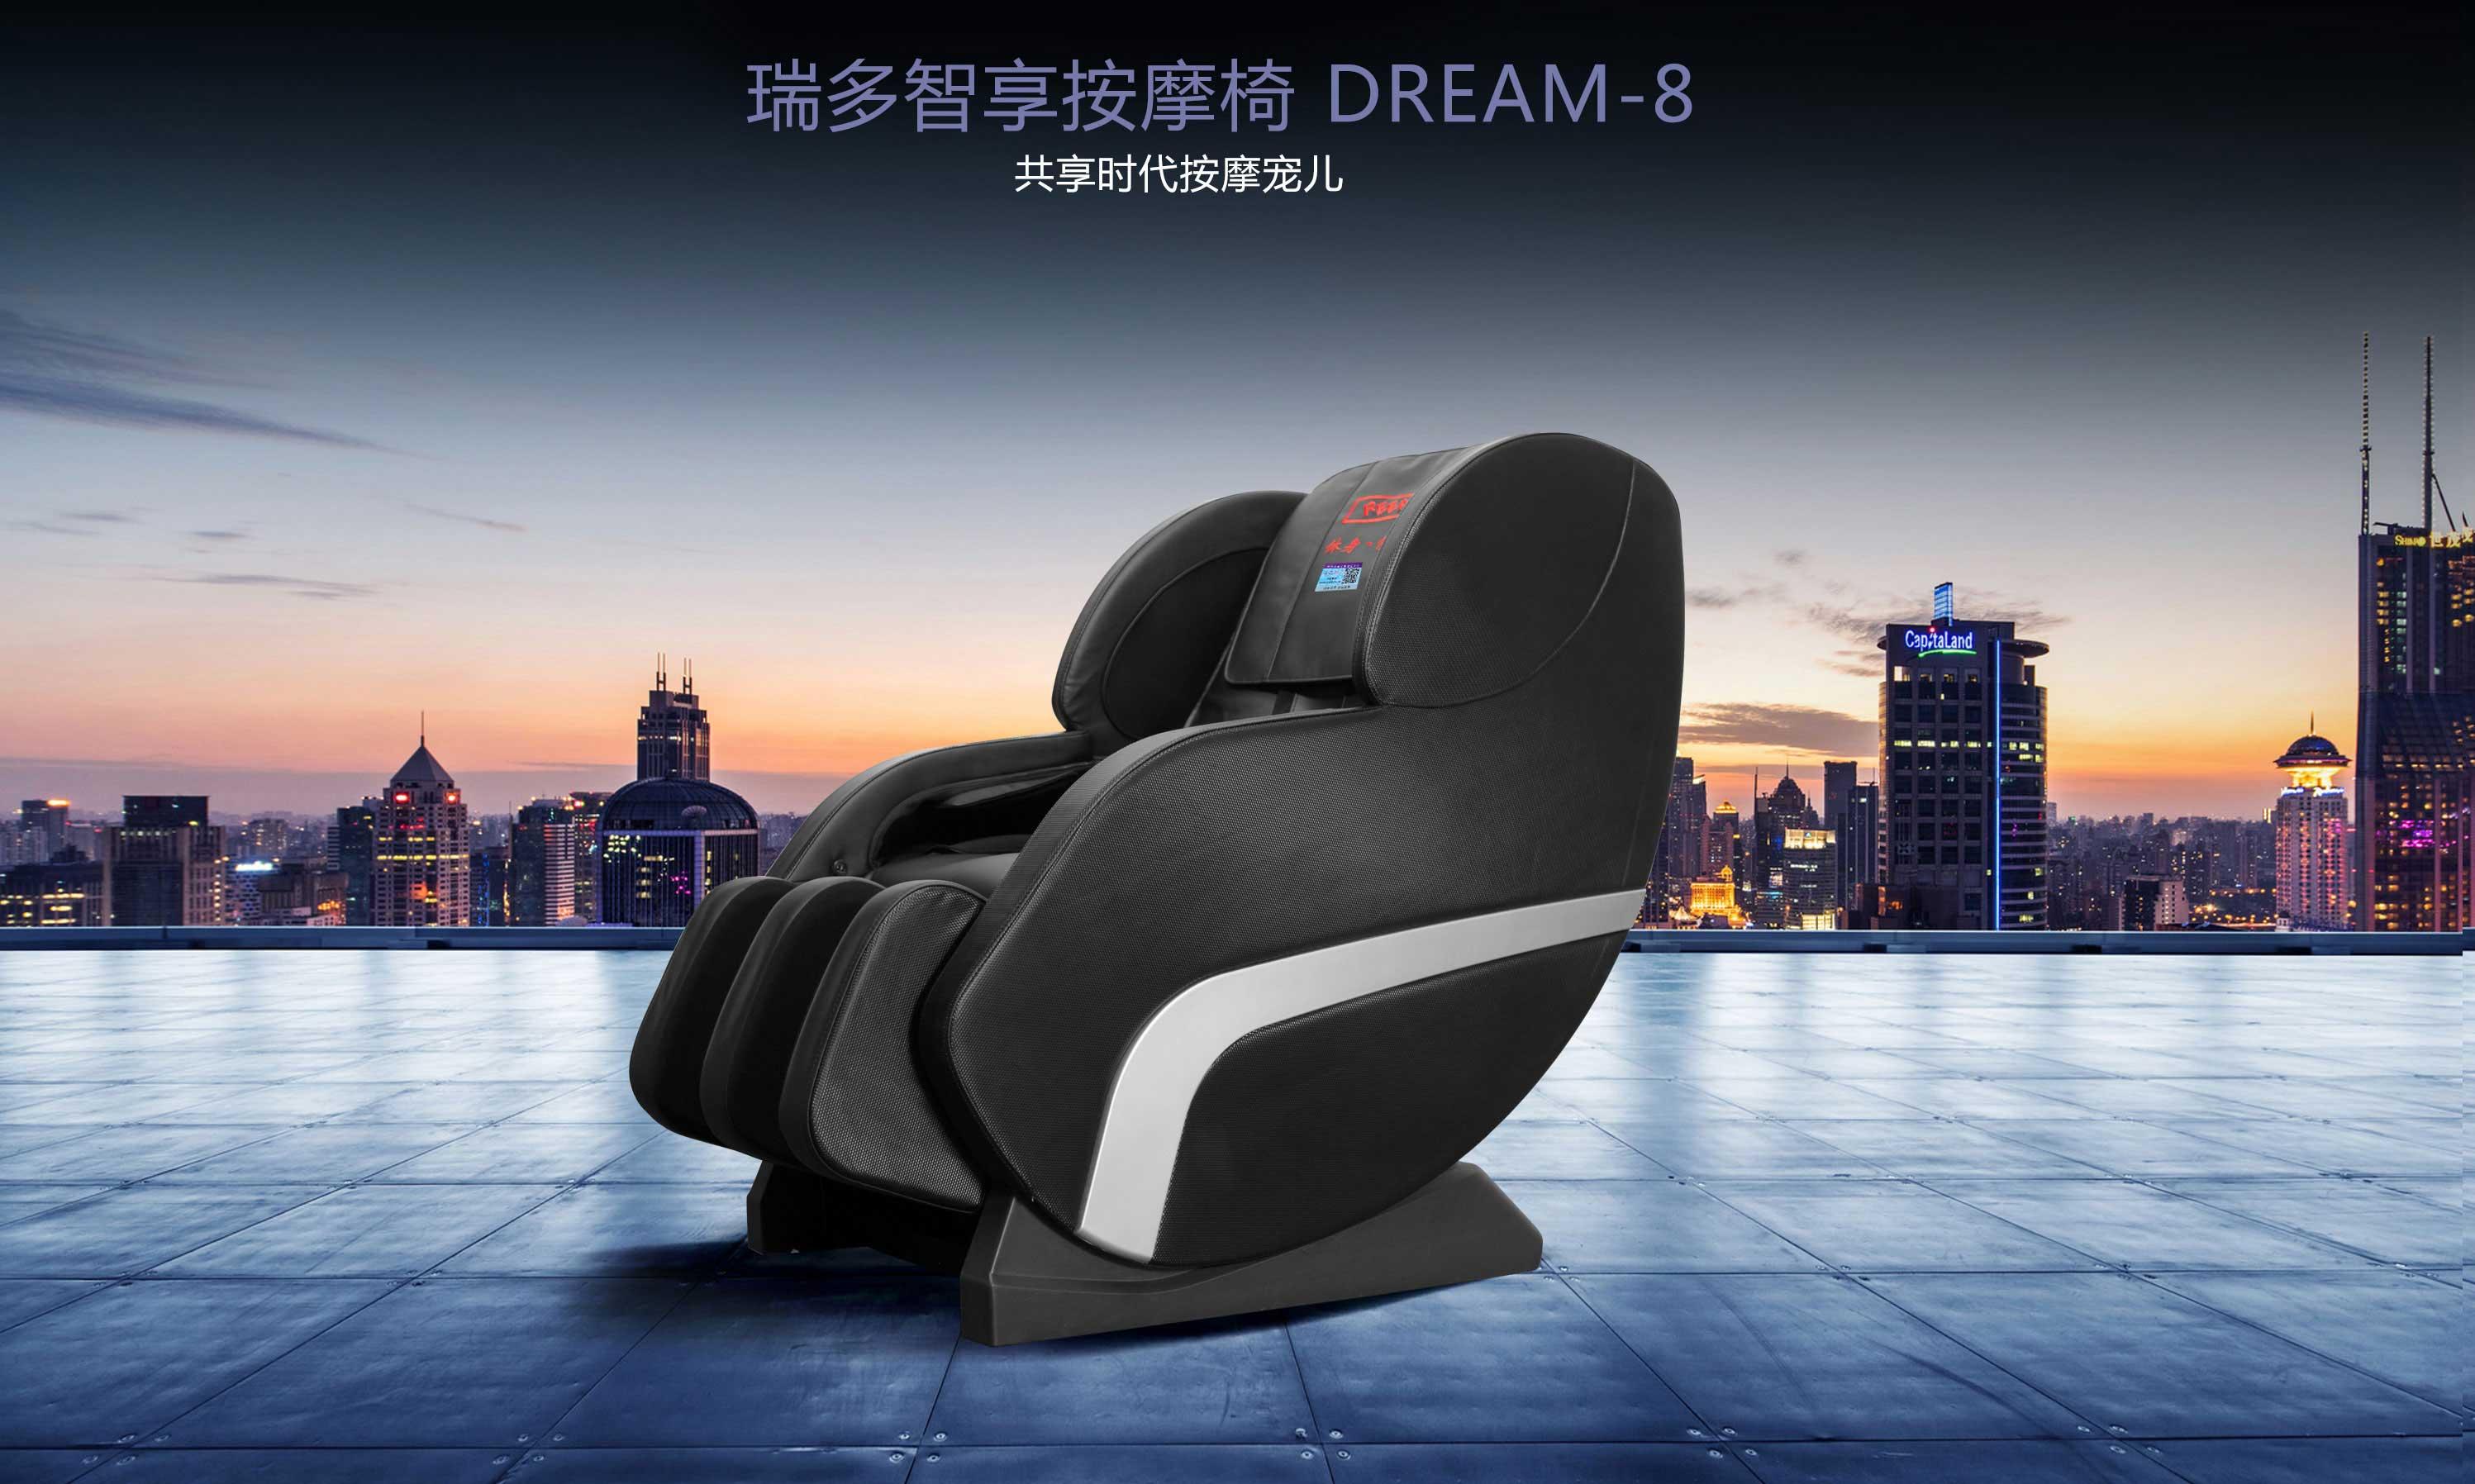 REEAD智享按摩椅DREAM-8,REEAD智享按摩椅,瑞多智享按摩椅,REEADDREAM按摩椅零重力姿势